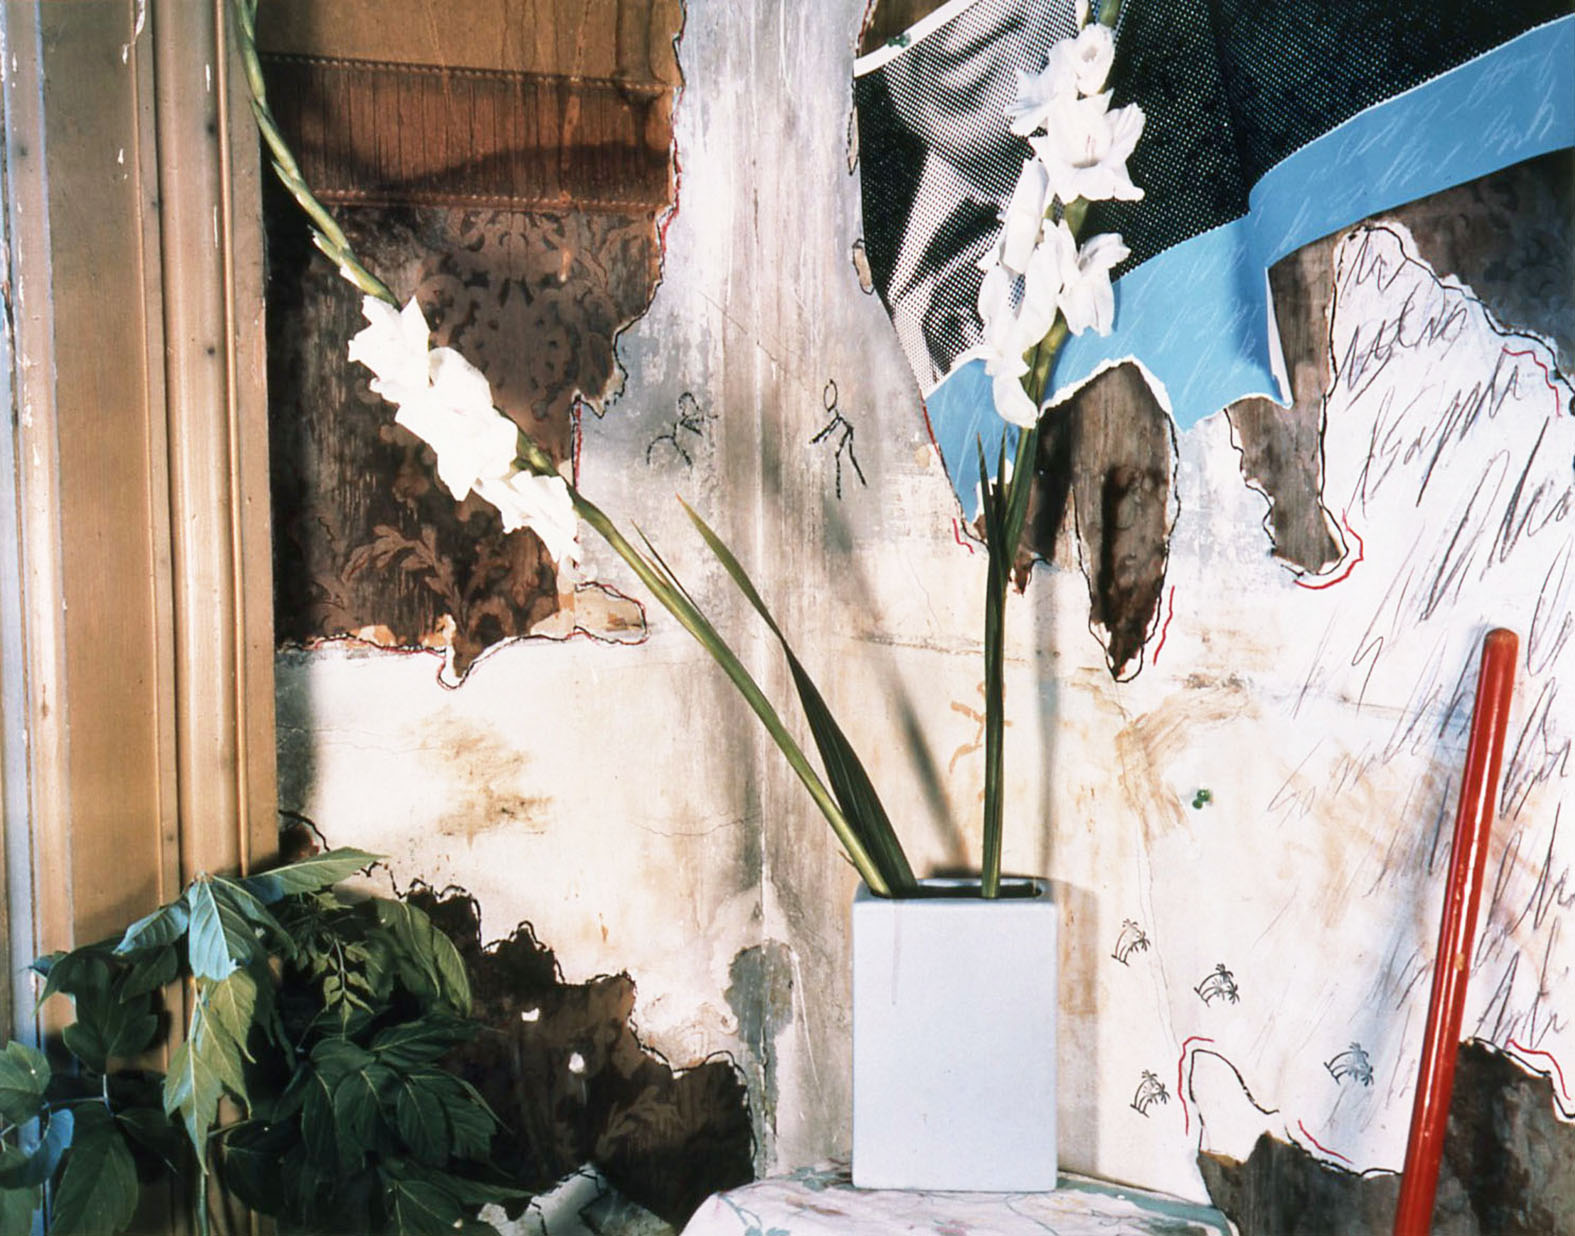 """Studio C Series/Man with Necktie, Gladiolas in Blue Vase"", 1985, 20x24"""